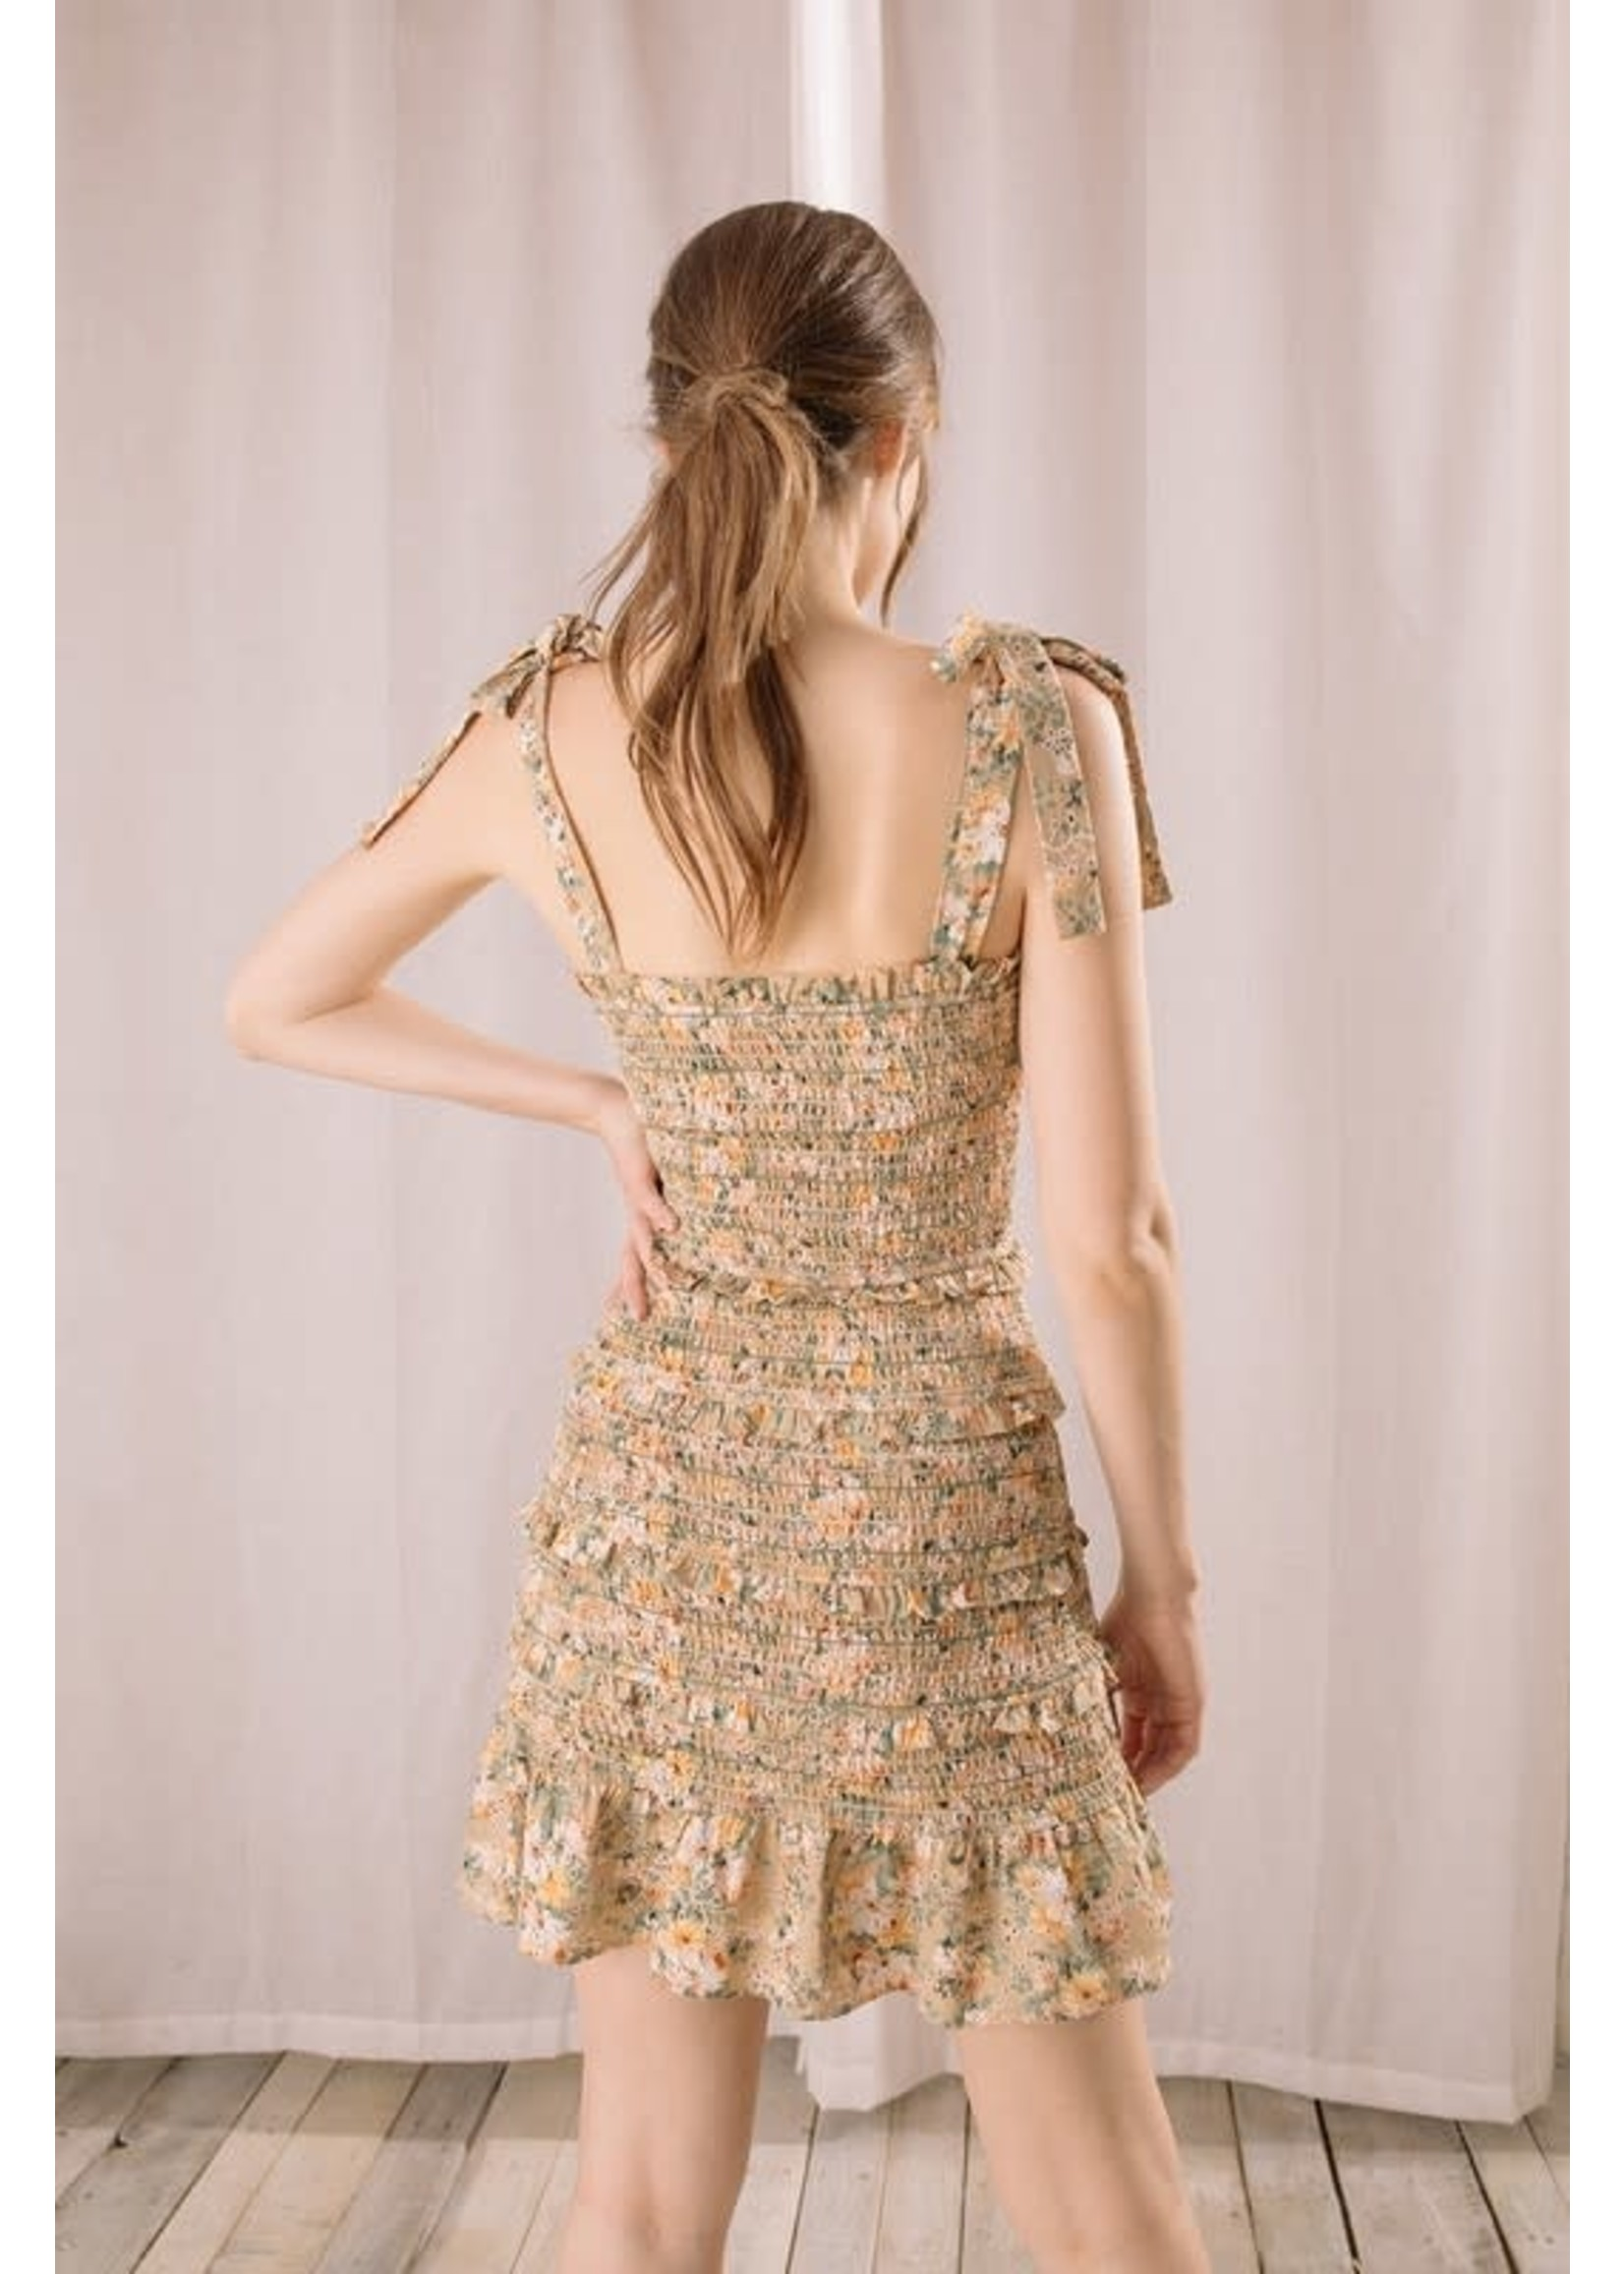 Storia Floral Print Bodycon Mini Dress - JD2128K